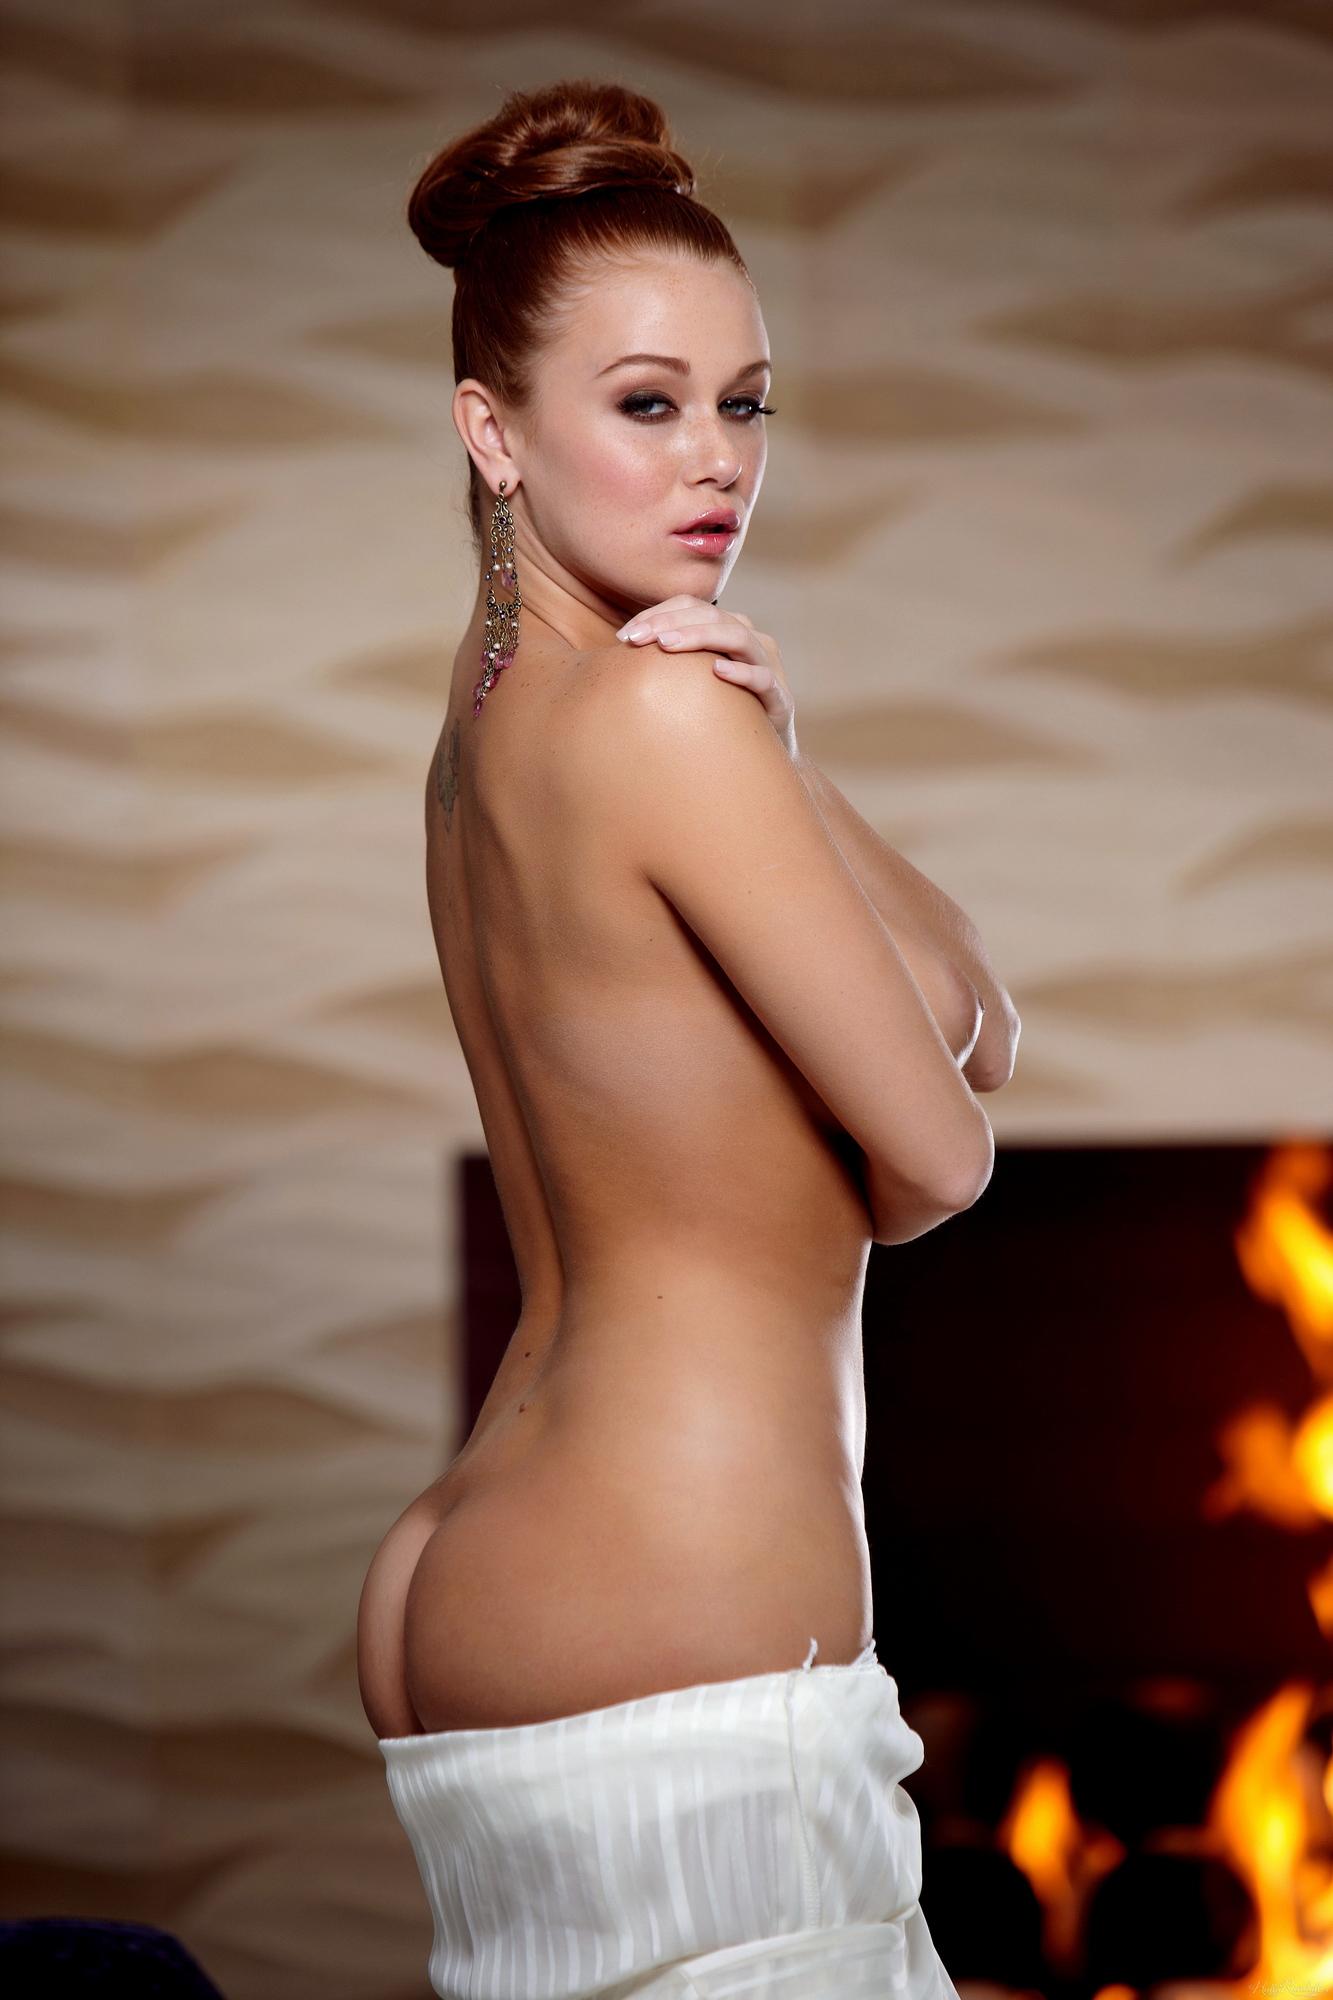 leanna-decker-nude-fireplace-redhead-hollyrandall-11